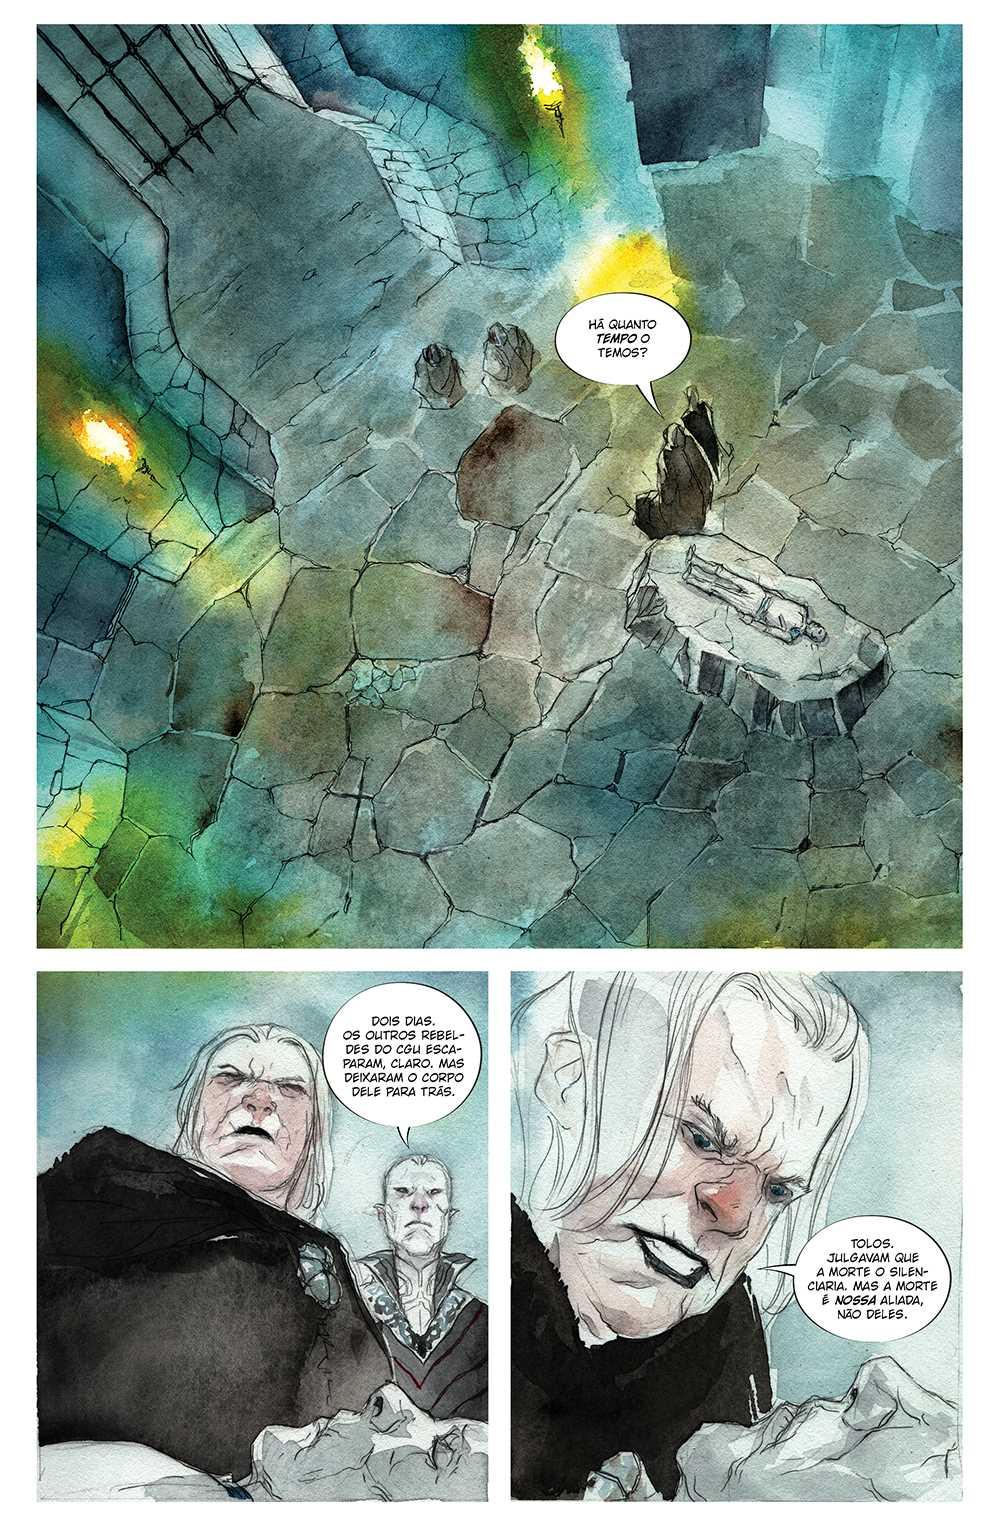 ASCENDER vol.1: A Galáxia Assombrada